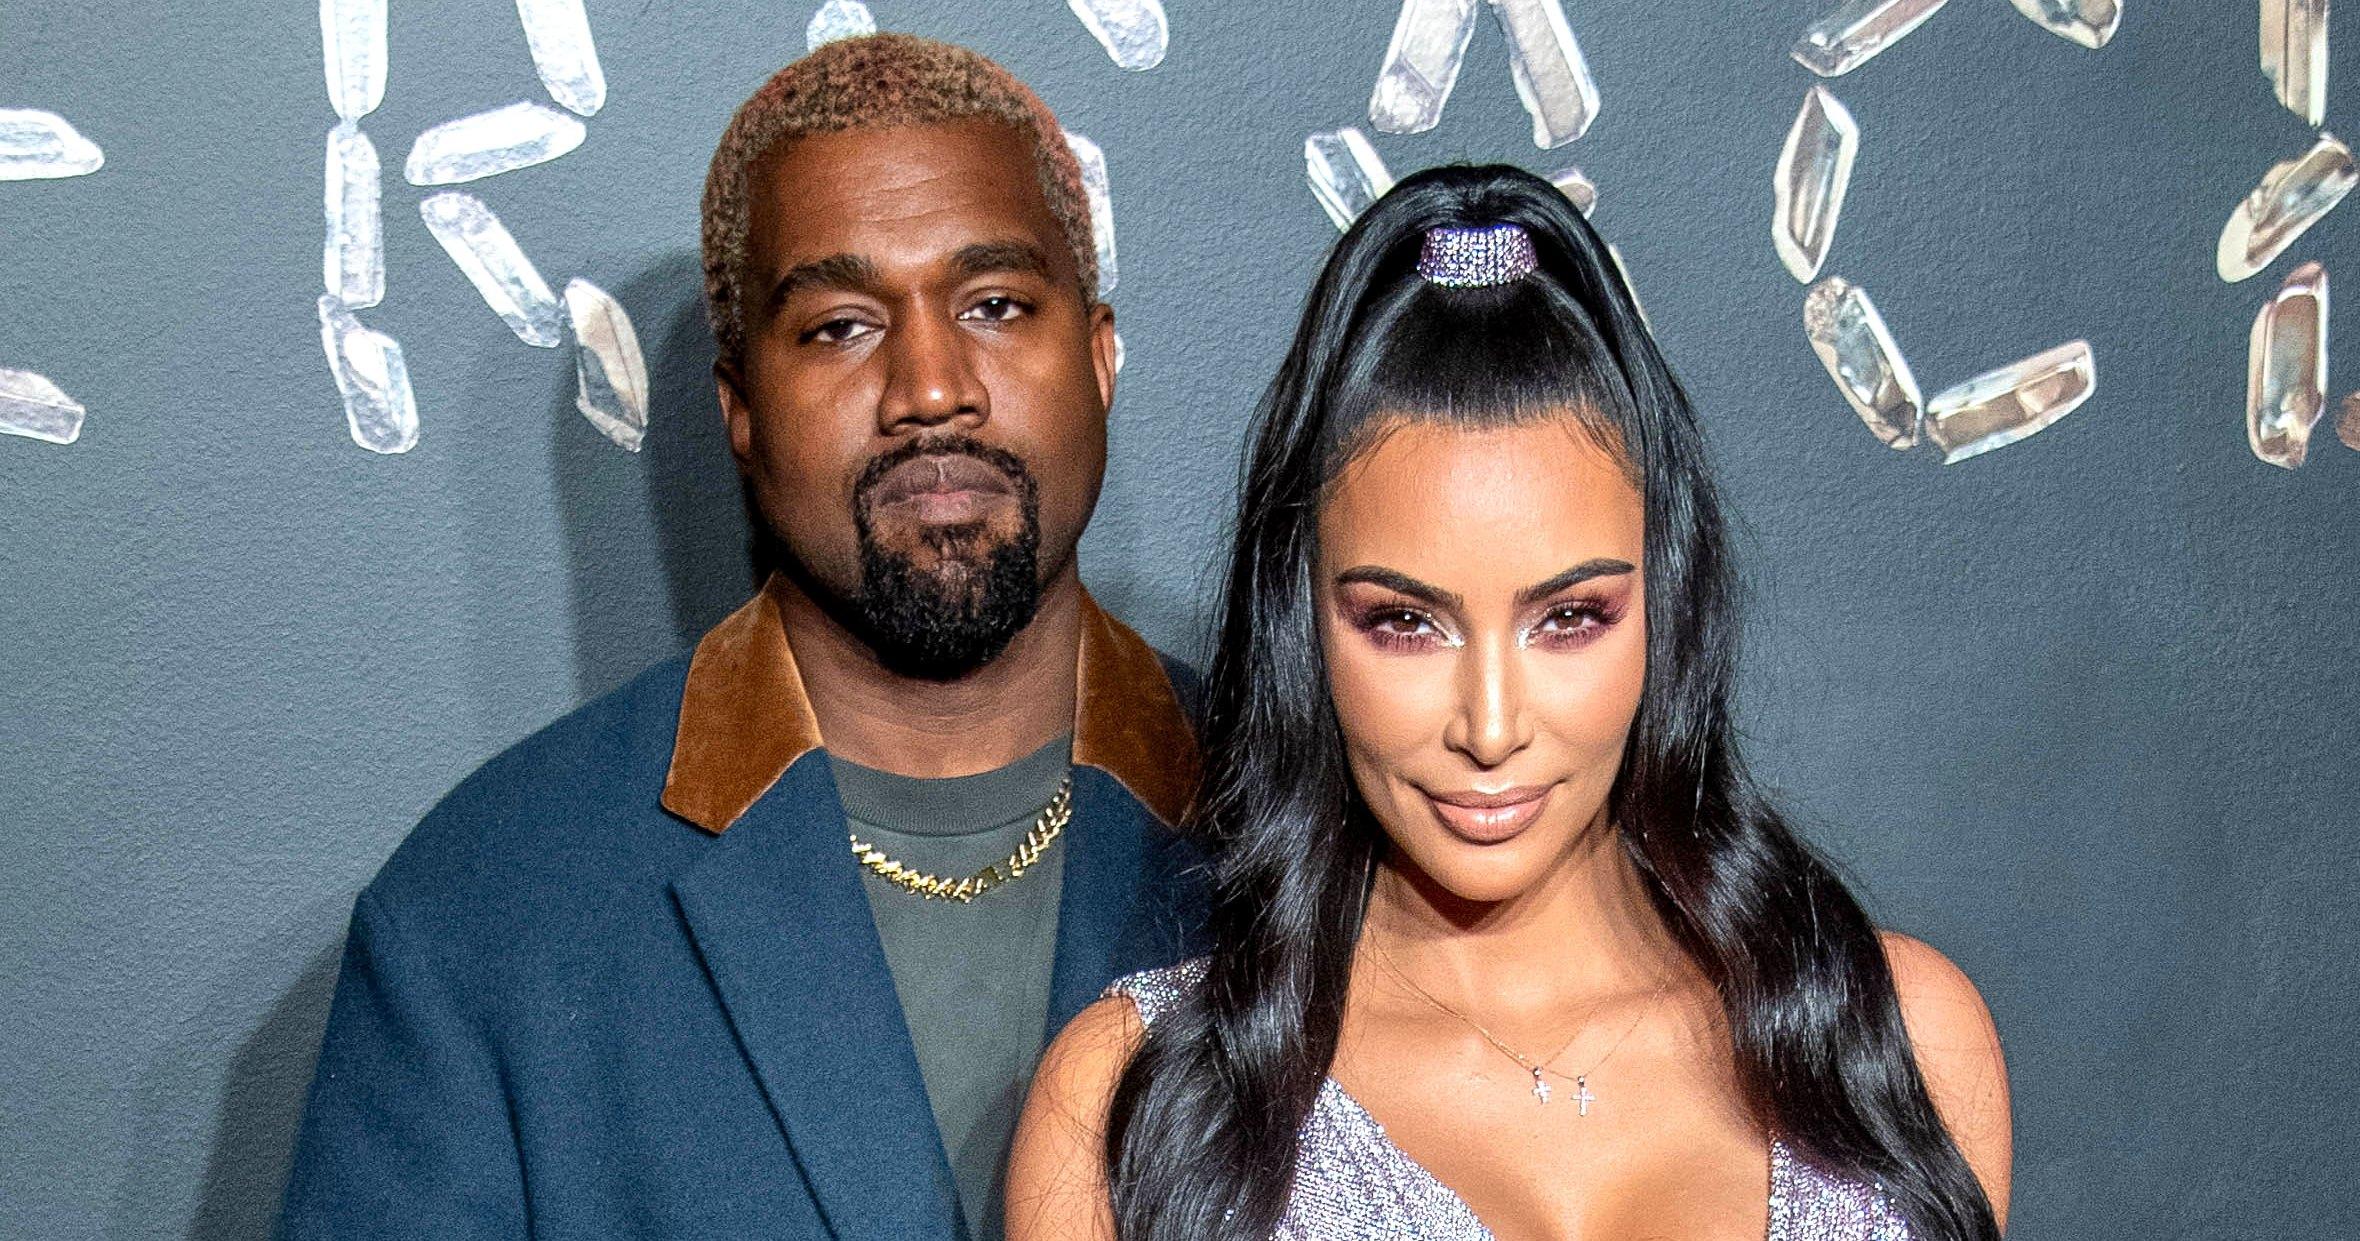 Kim Kardashian, Kanye West Welcome 4th Child Via Surrogate